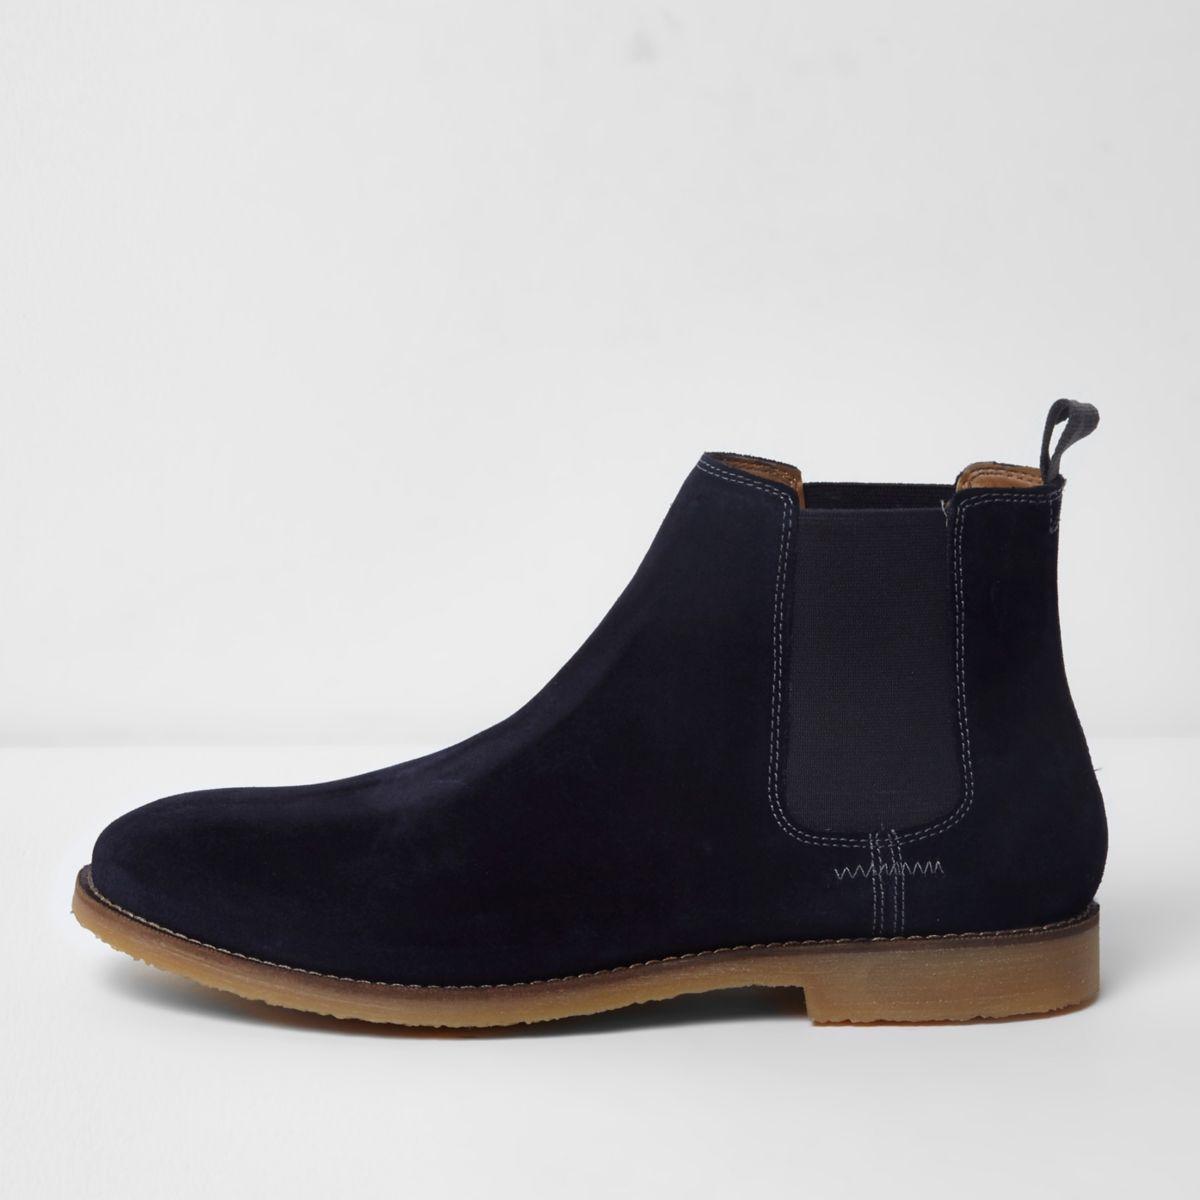 Navy suede chelsea boots